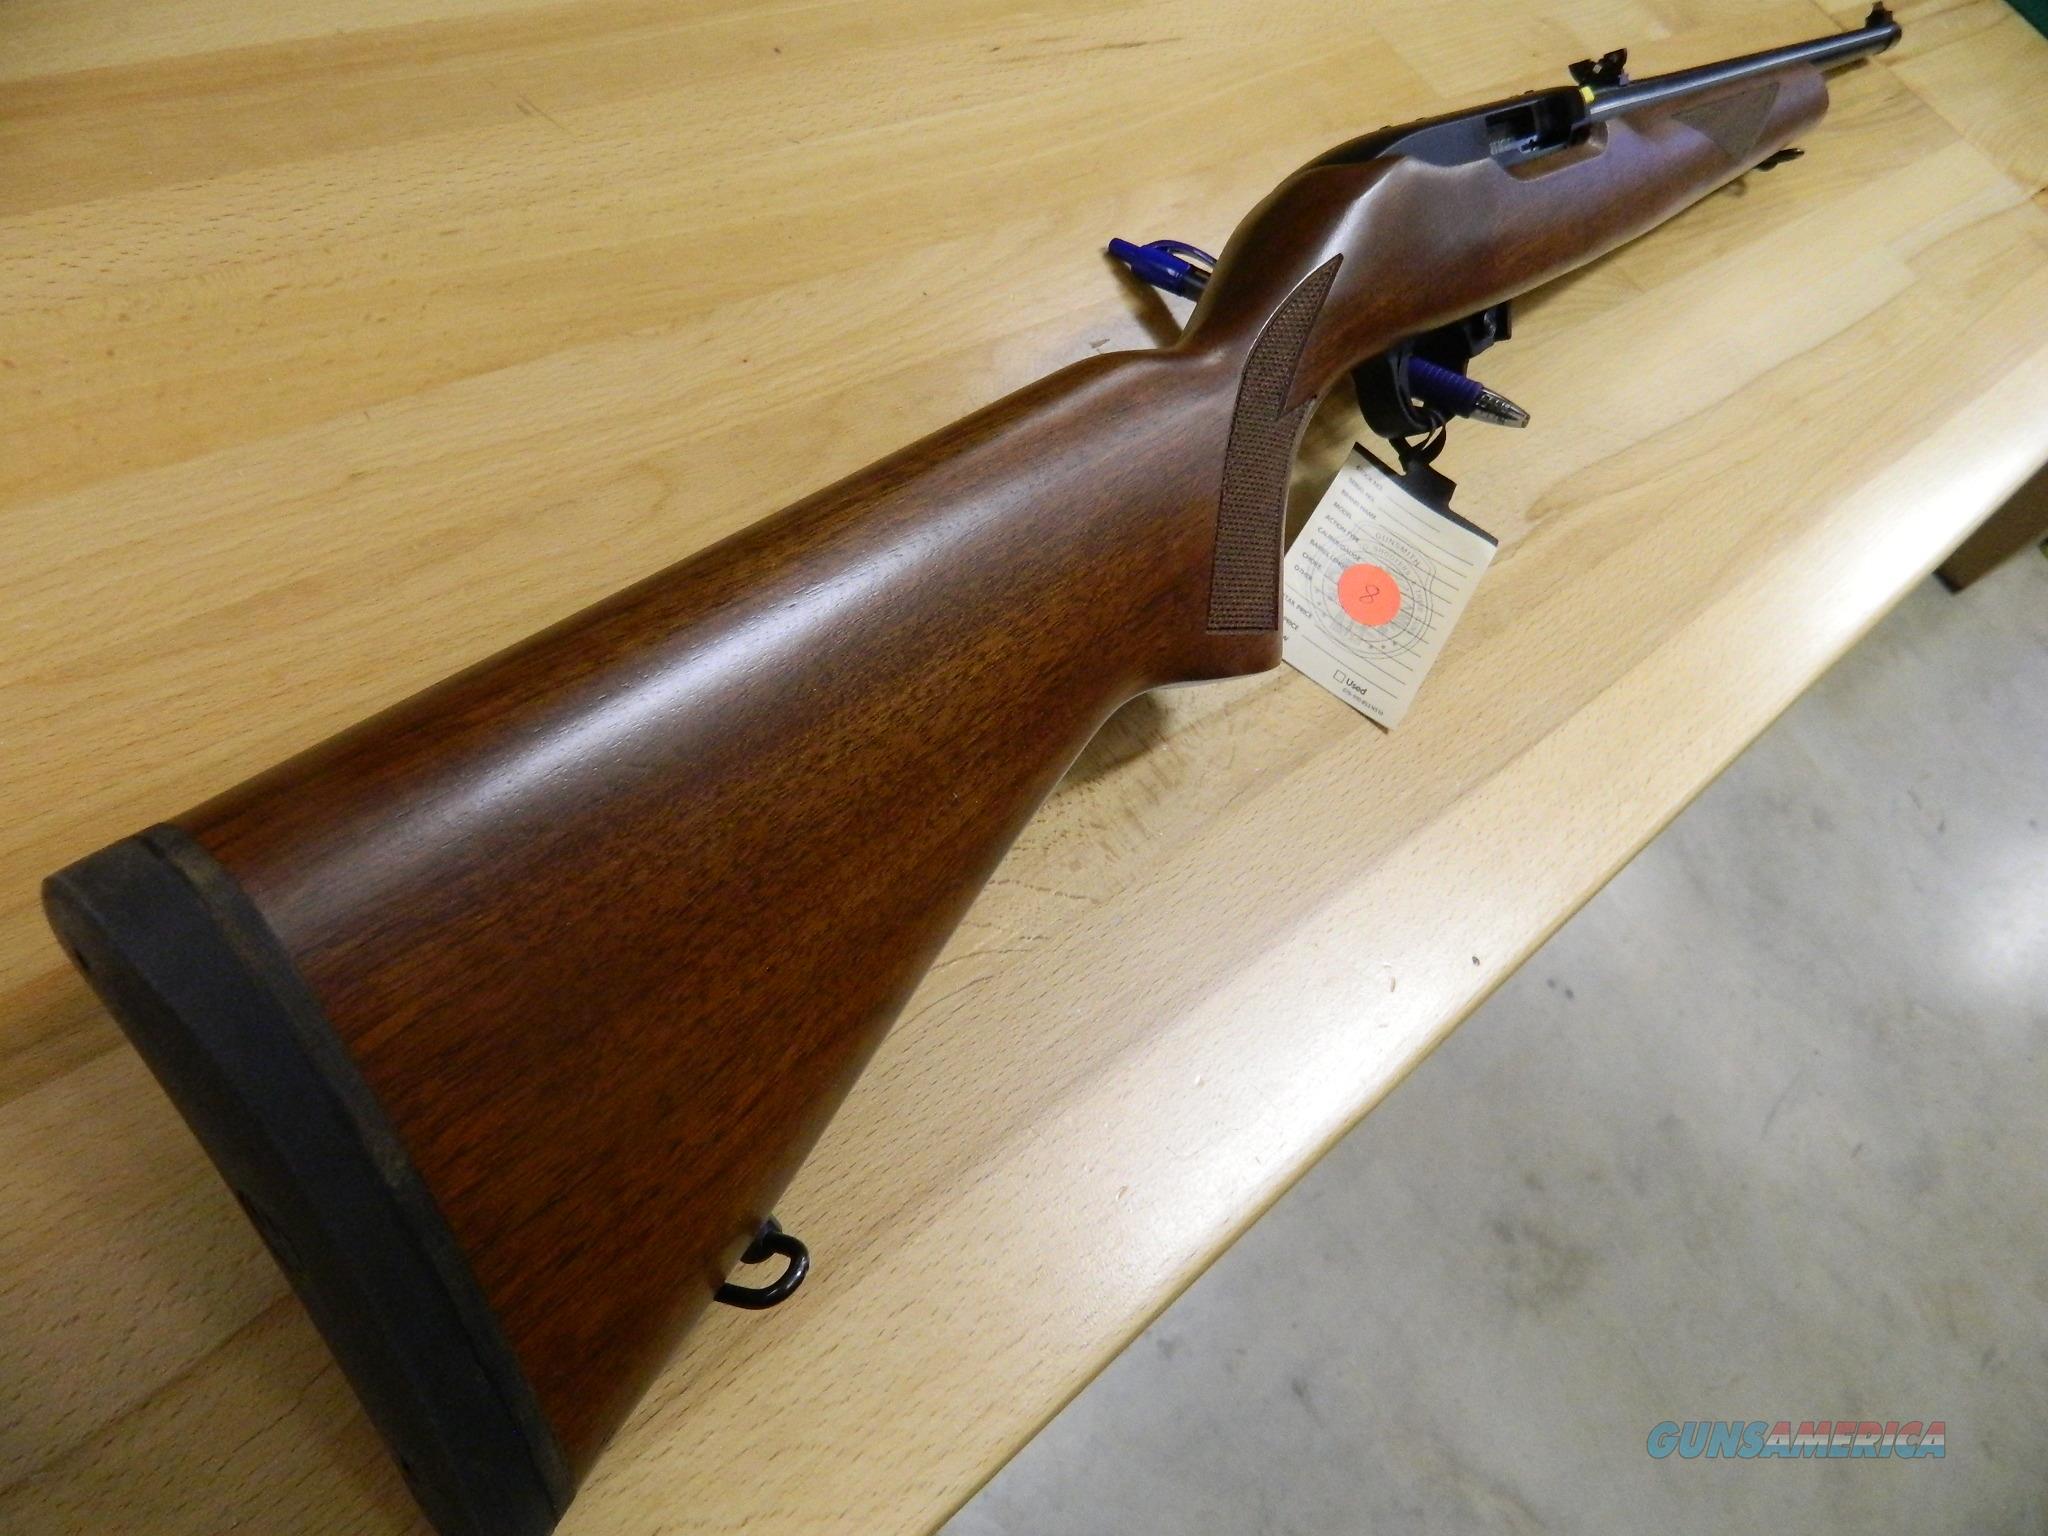 Ruger 10/22 Deluxe wood stock NIB .22 LR  Guns > Rifles > Ruger Rifles > 10-22